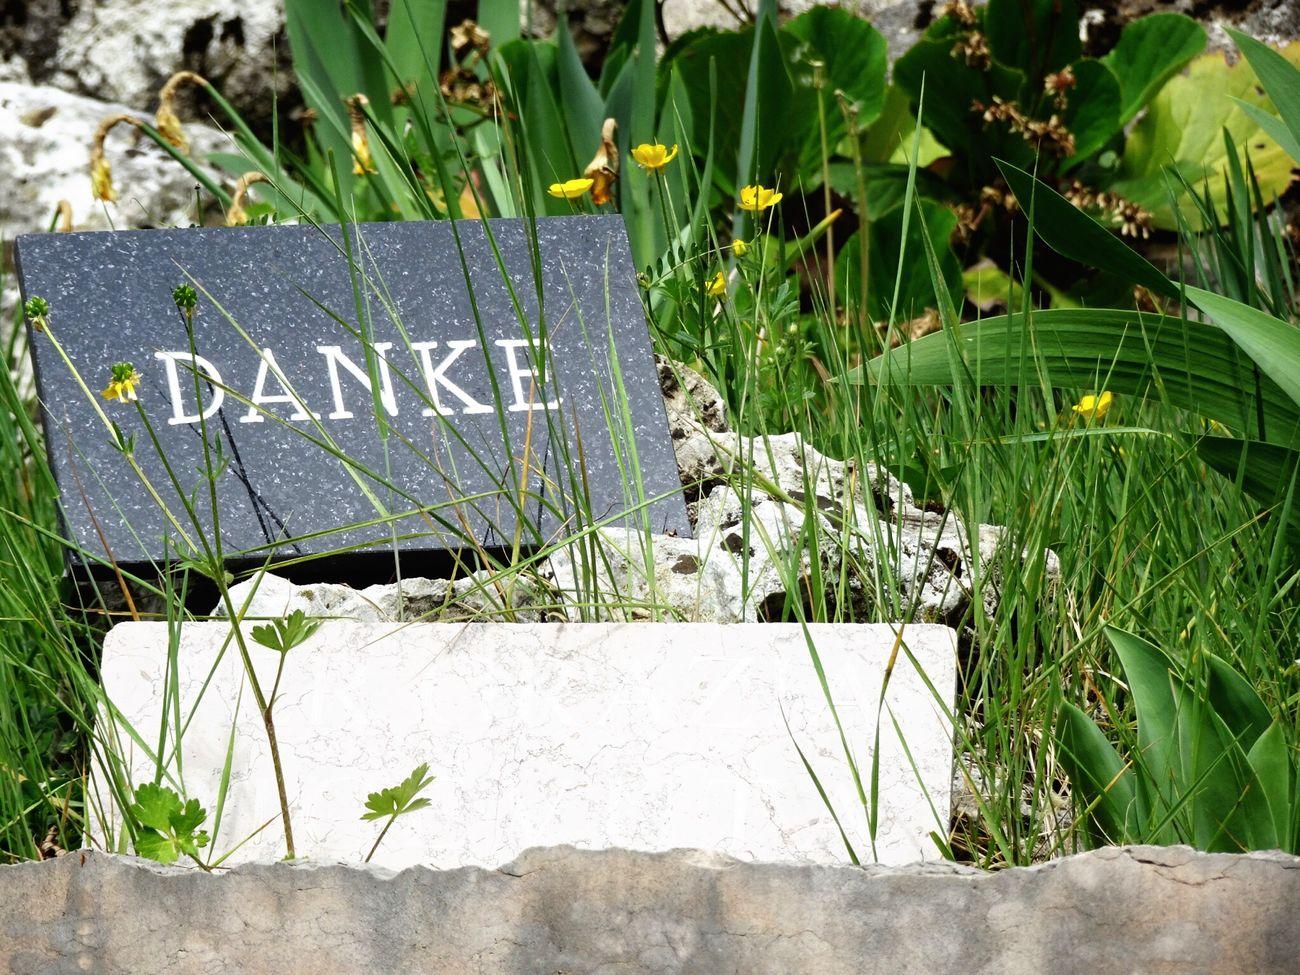 Danke  Thankyou Saying Thanks! Outdoors Text Grass Nature Close-up Schio Italy Flowers Spring Grateful Being Grateful Schild Sign German Tedesco